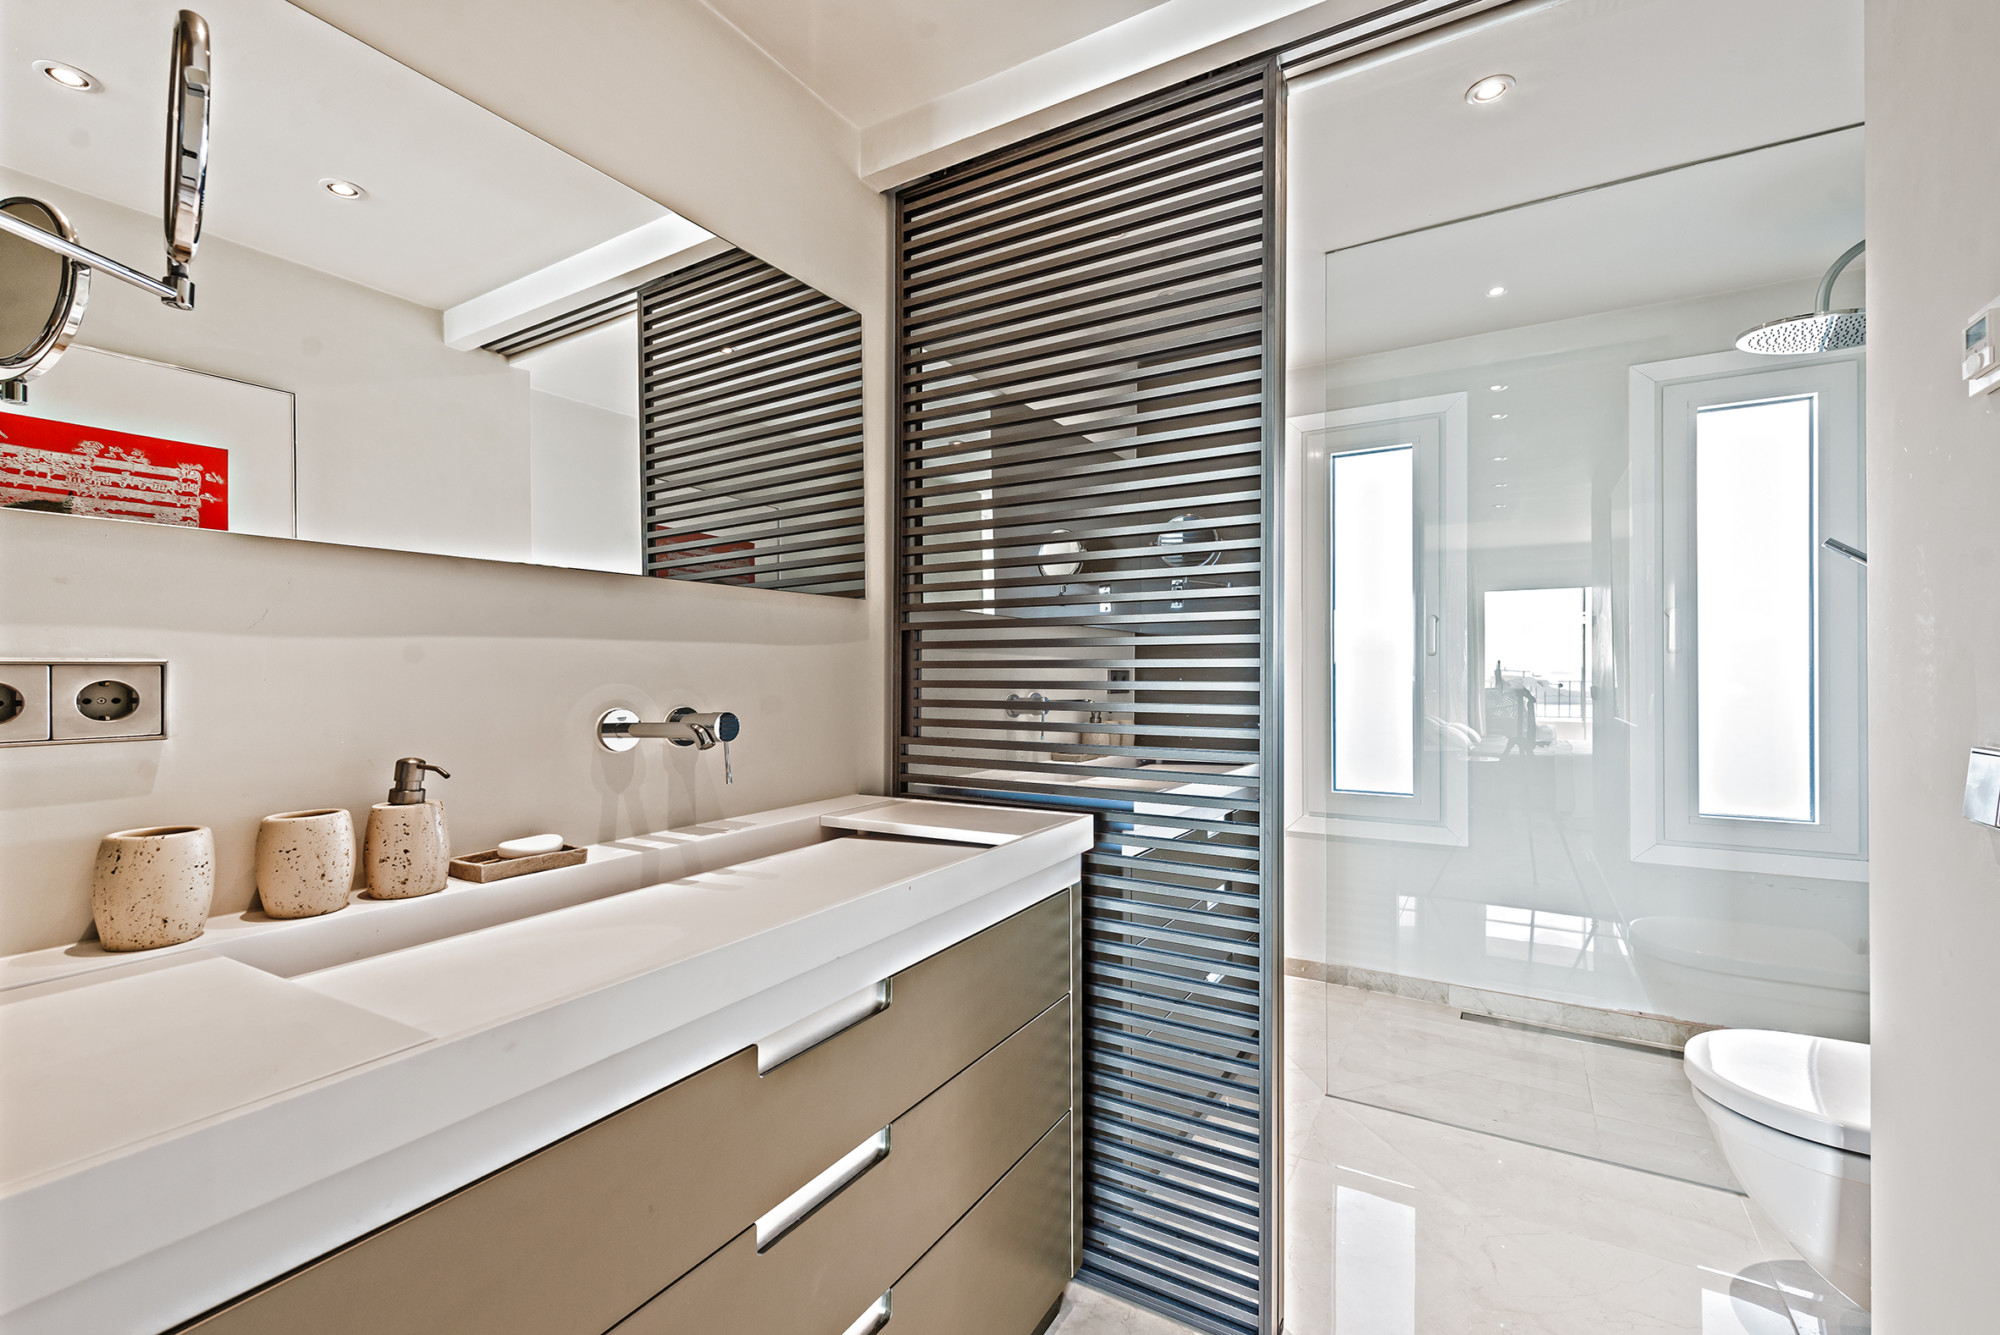 Designerwohnung-1-Meereslinie-Cala-Vinyas-Puerto-Portals-Palma